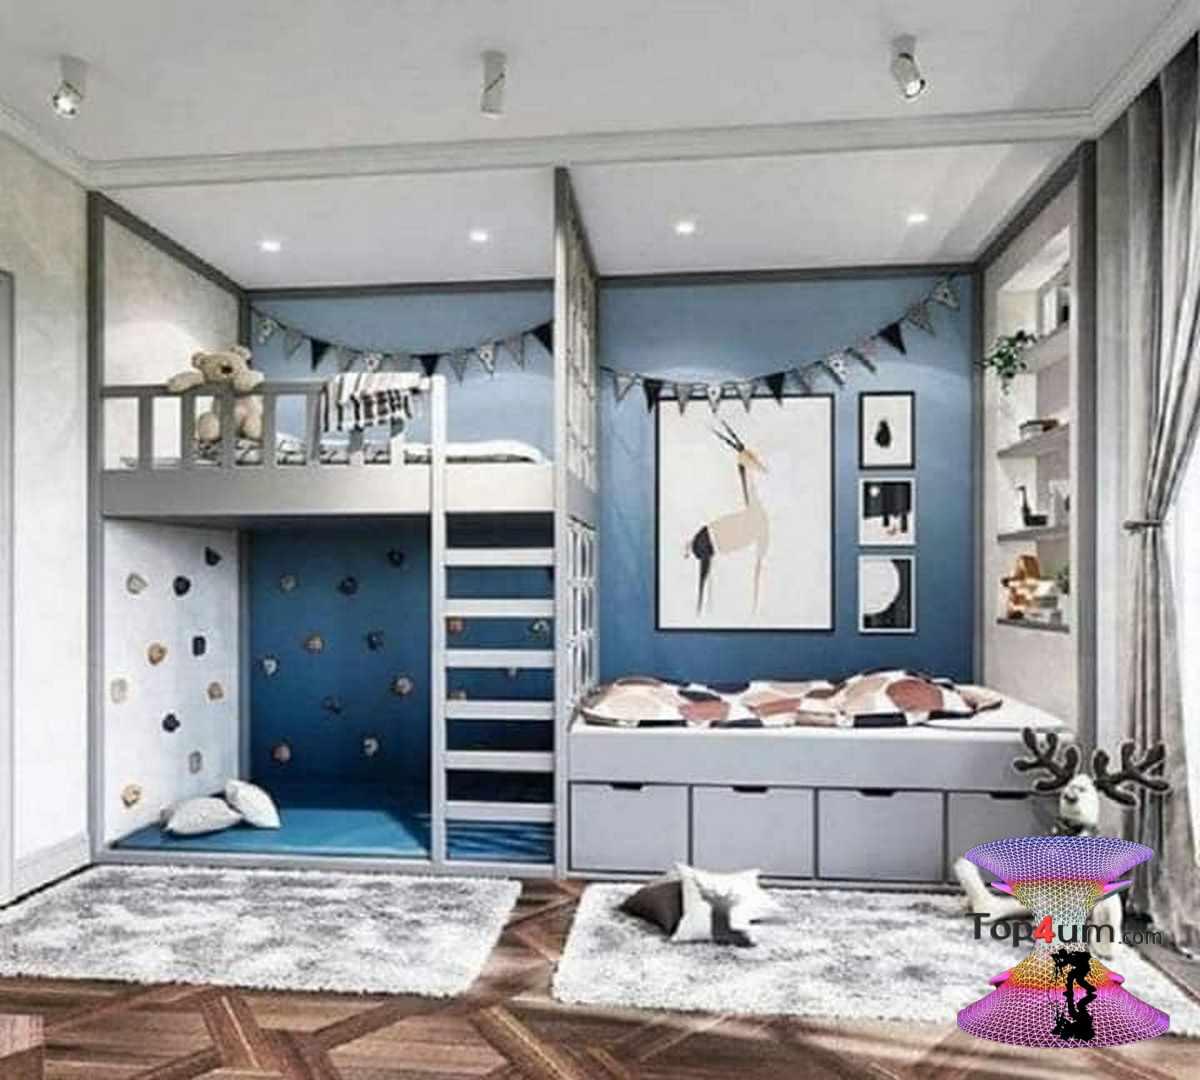 f:id:kitchendesignsegypt:20191020020856j:plain